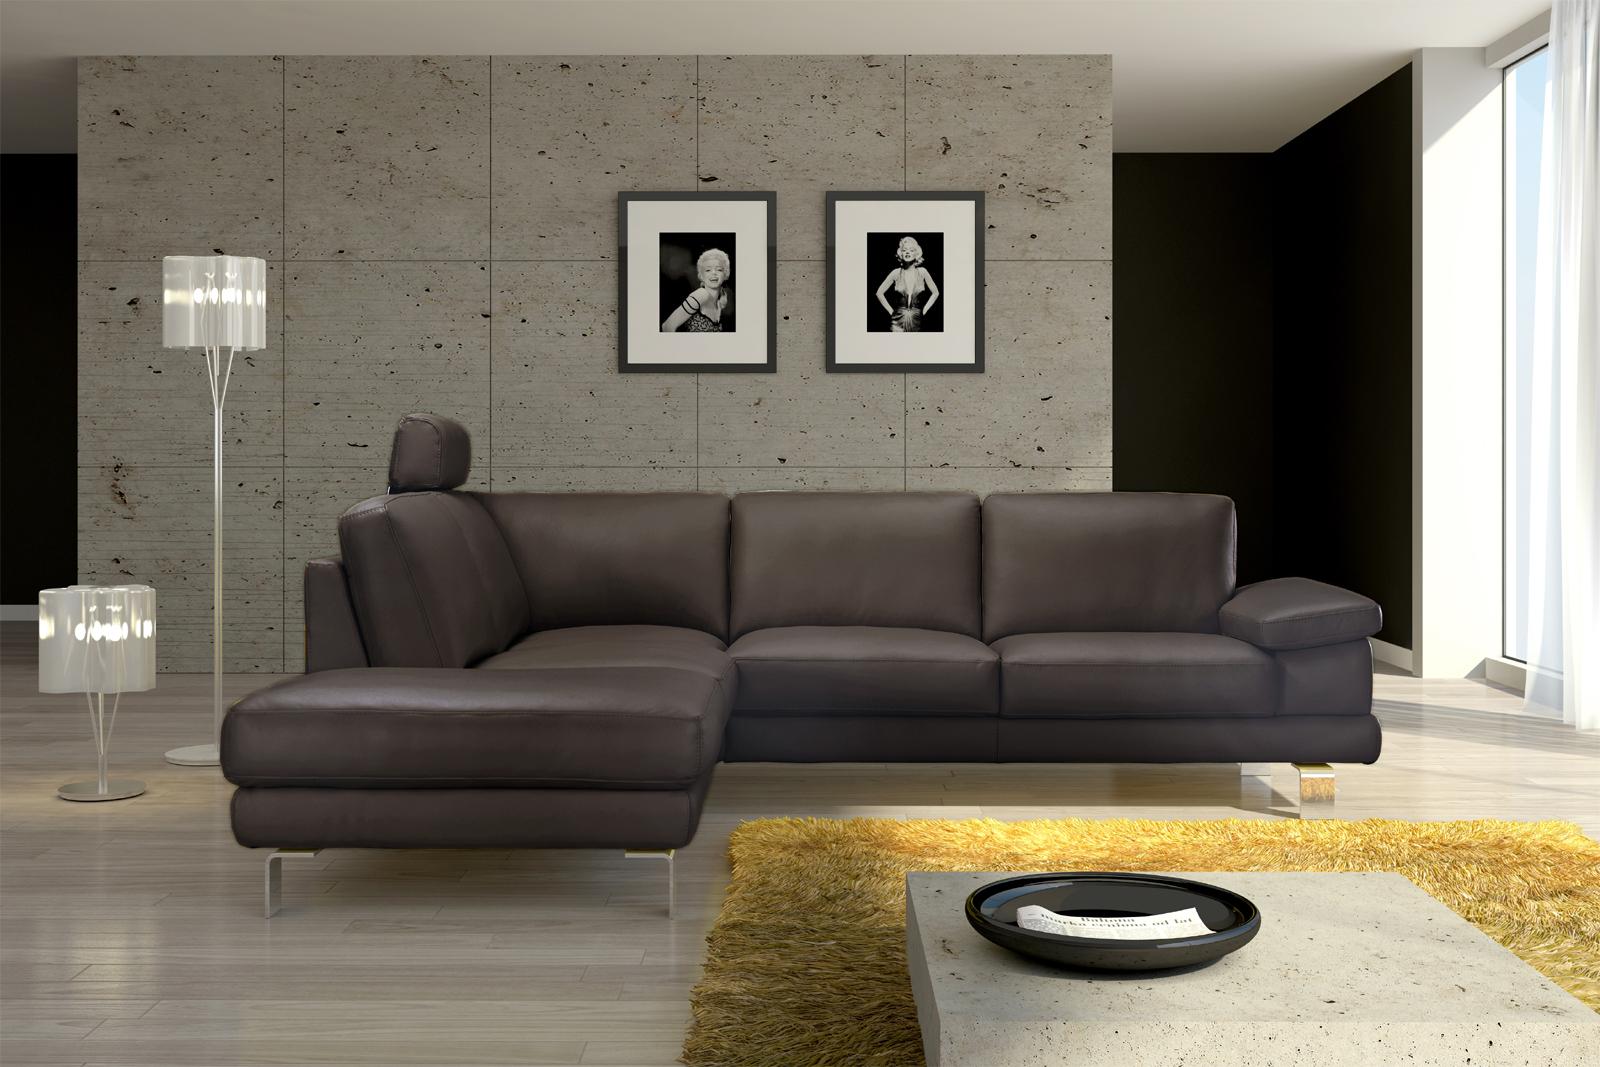 sam ecksofa braun polsterecke mezzo 220 x 270 cm auf lager. Black Bedroom Furniture Sets. Home Design Ideas